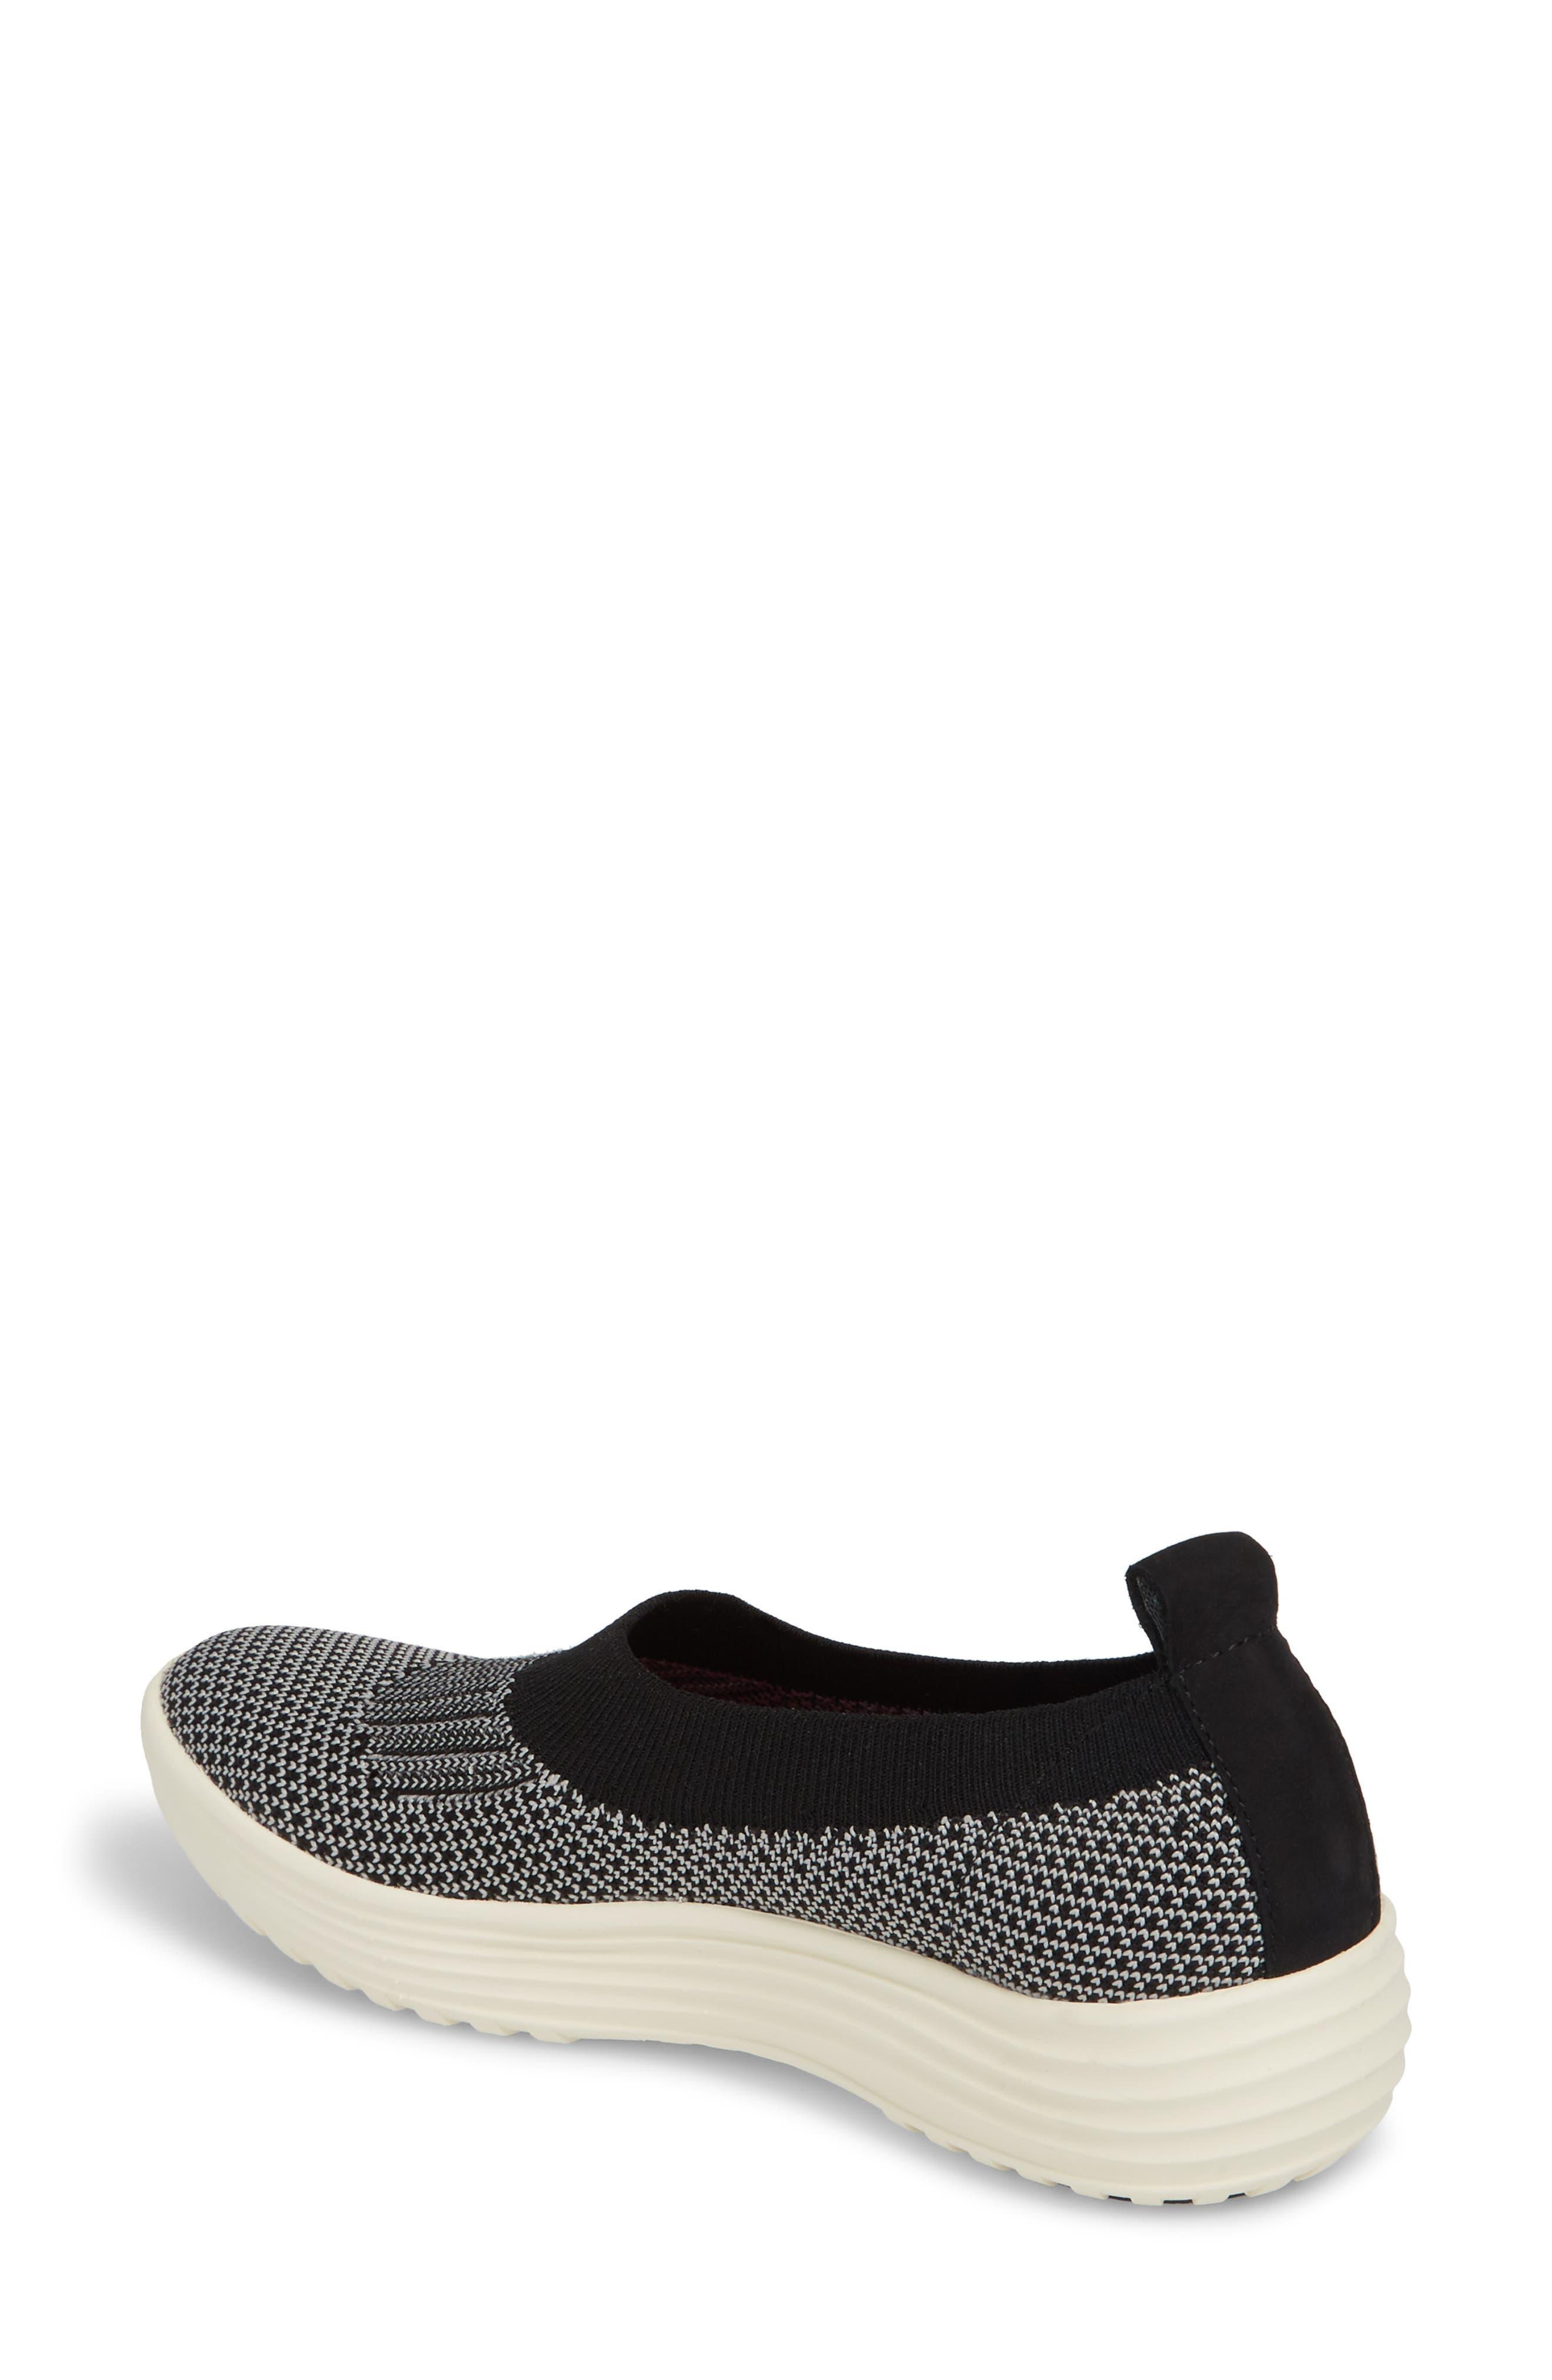 Merigold Slip-On Sock Fit Sneaker,                             Alternate thumbnail 2, color,                             BLACK/ MIST GREY FABRIC